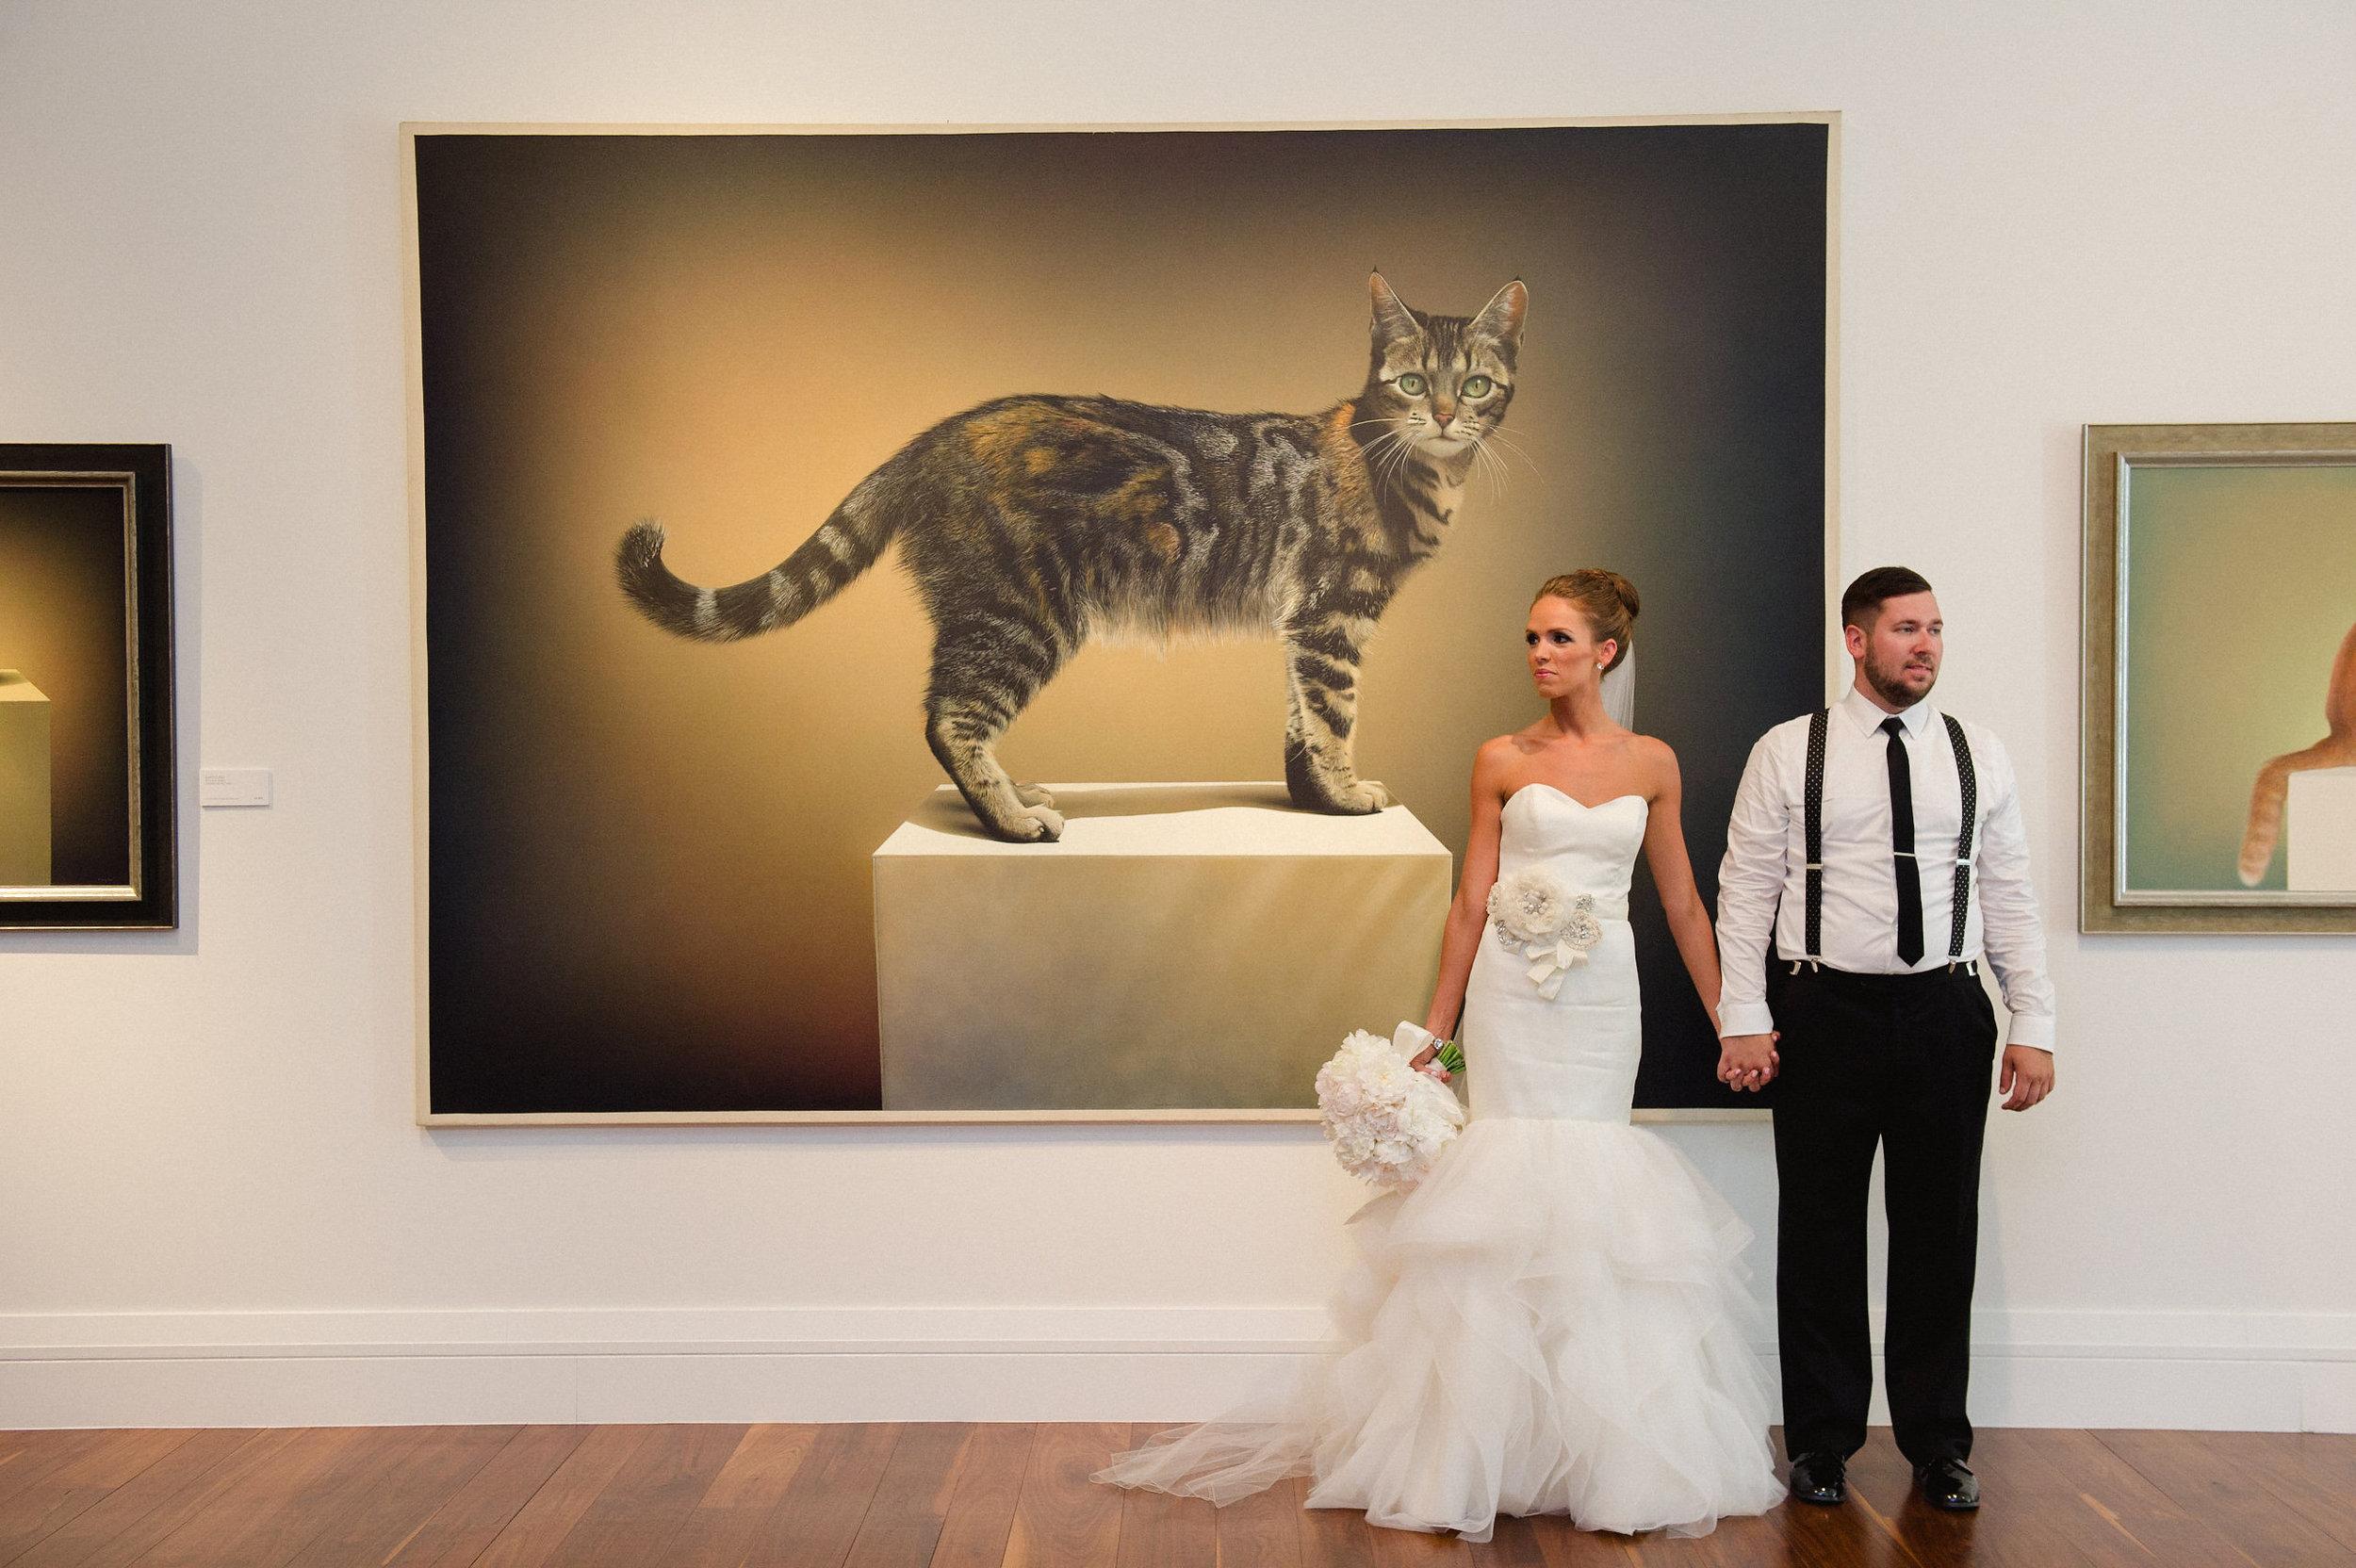 shelby&jordan|smitten&hooked|wedding|groups-112.jpg